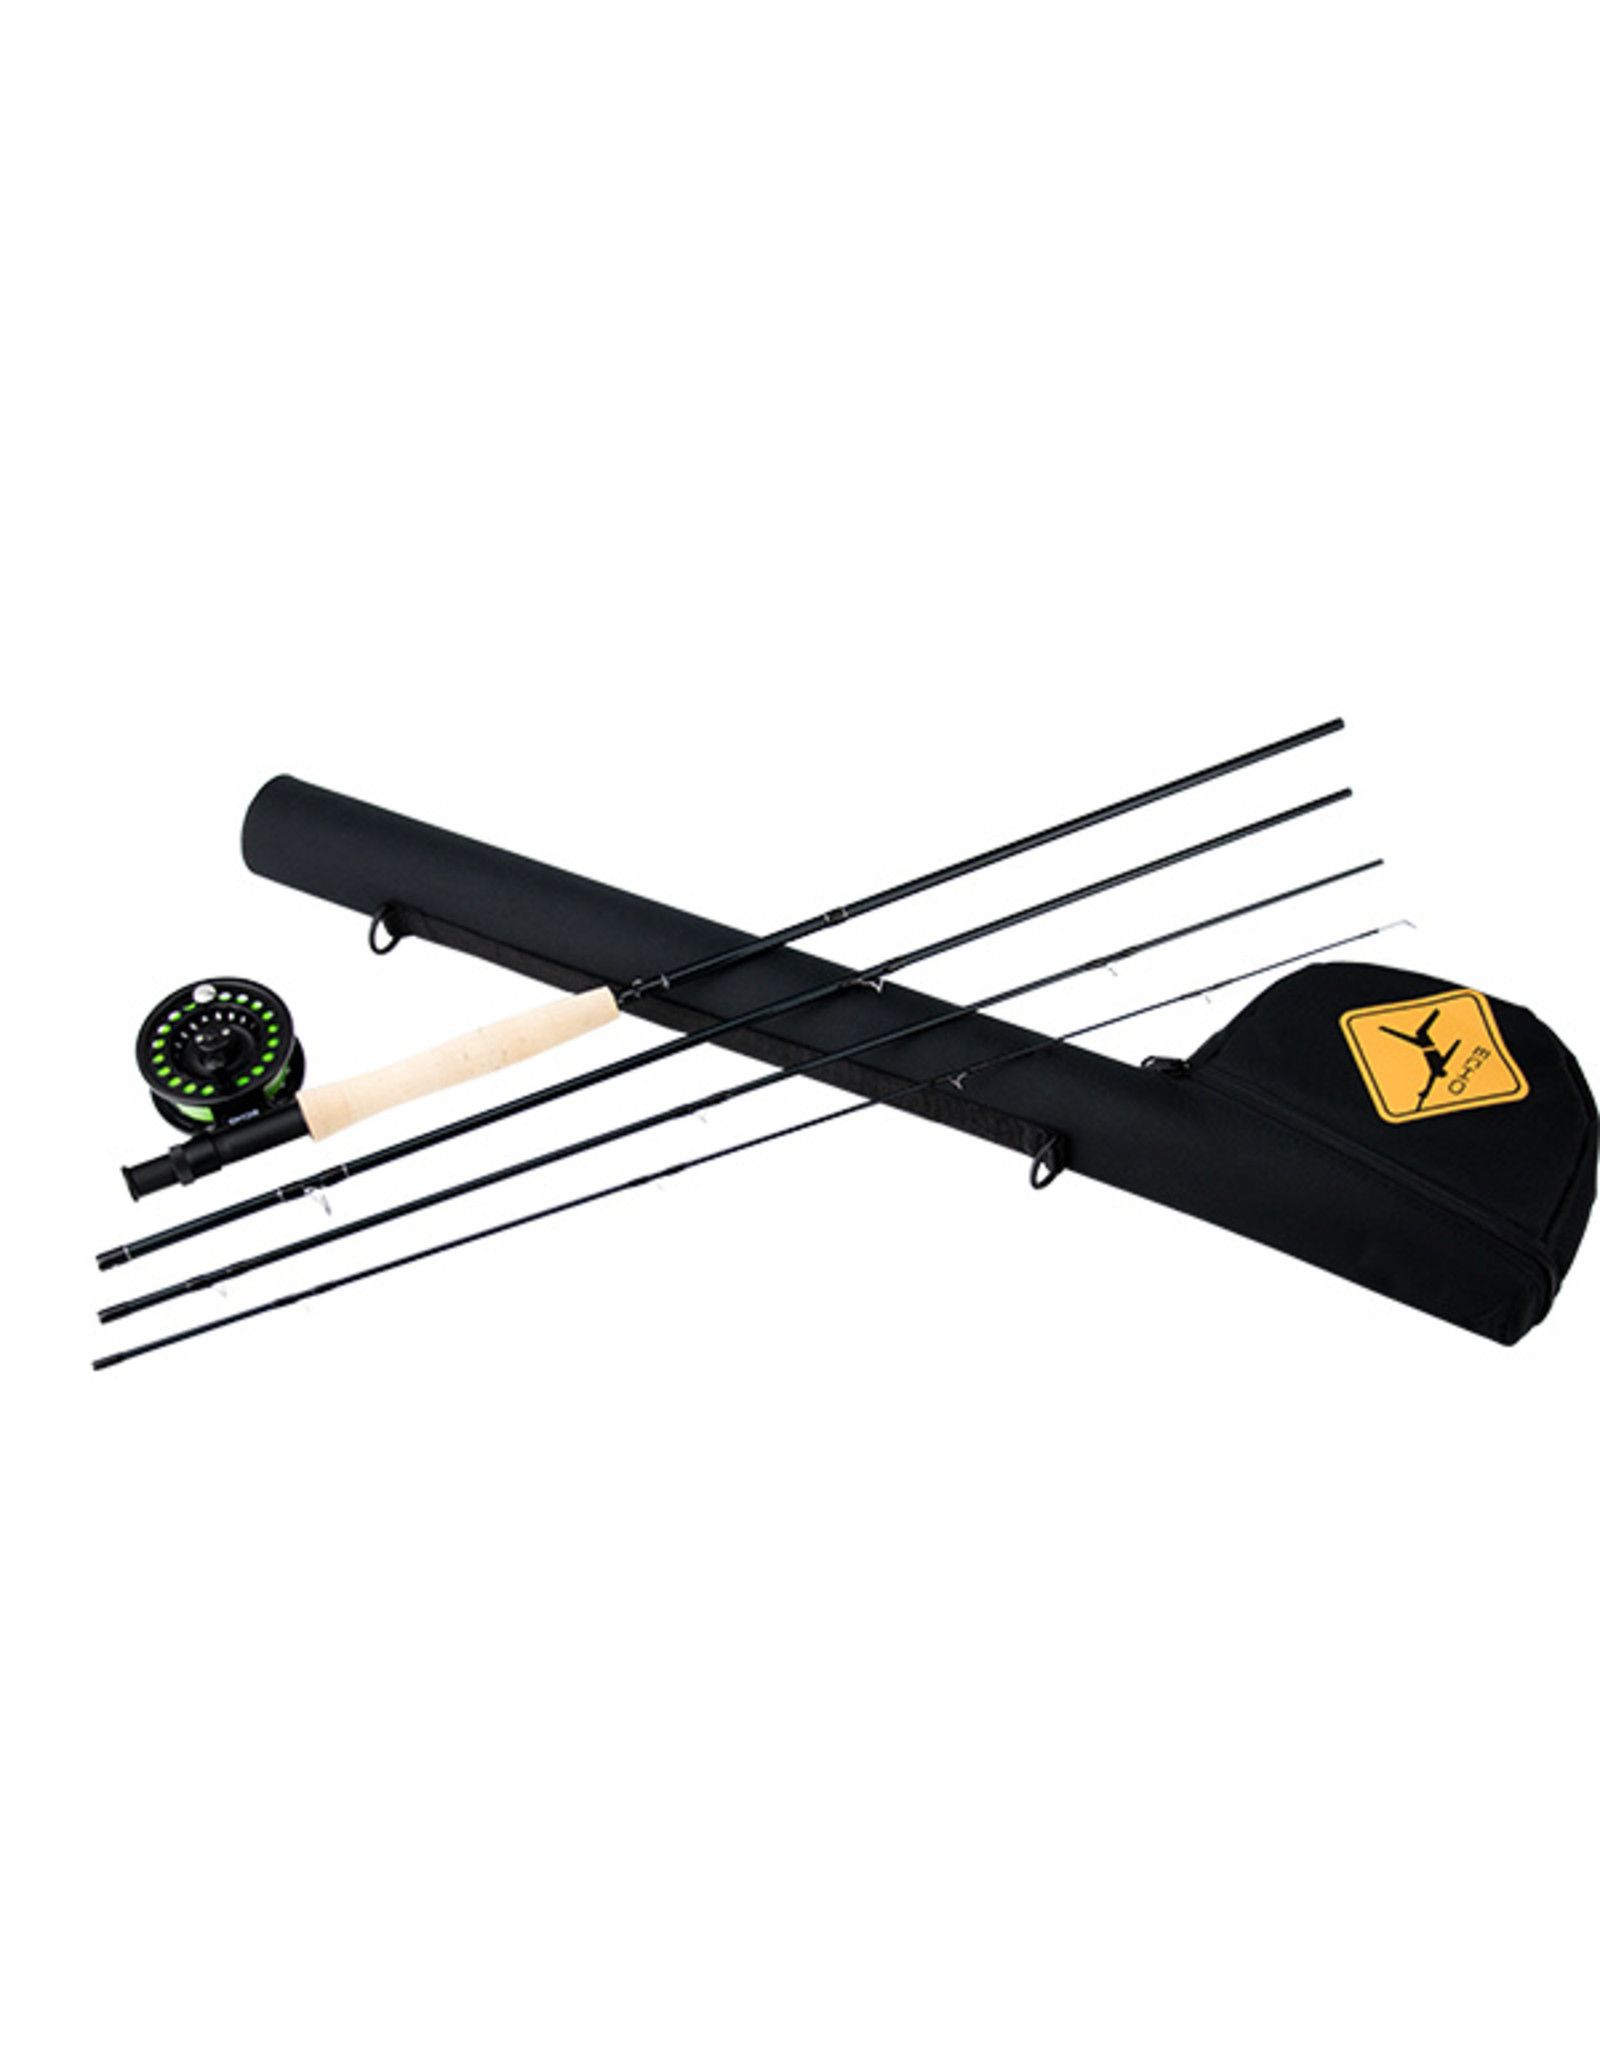 Rajeff Sports Echo - Base Kit